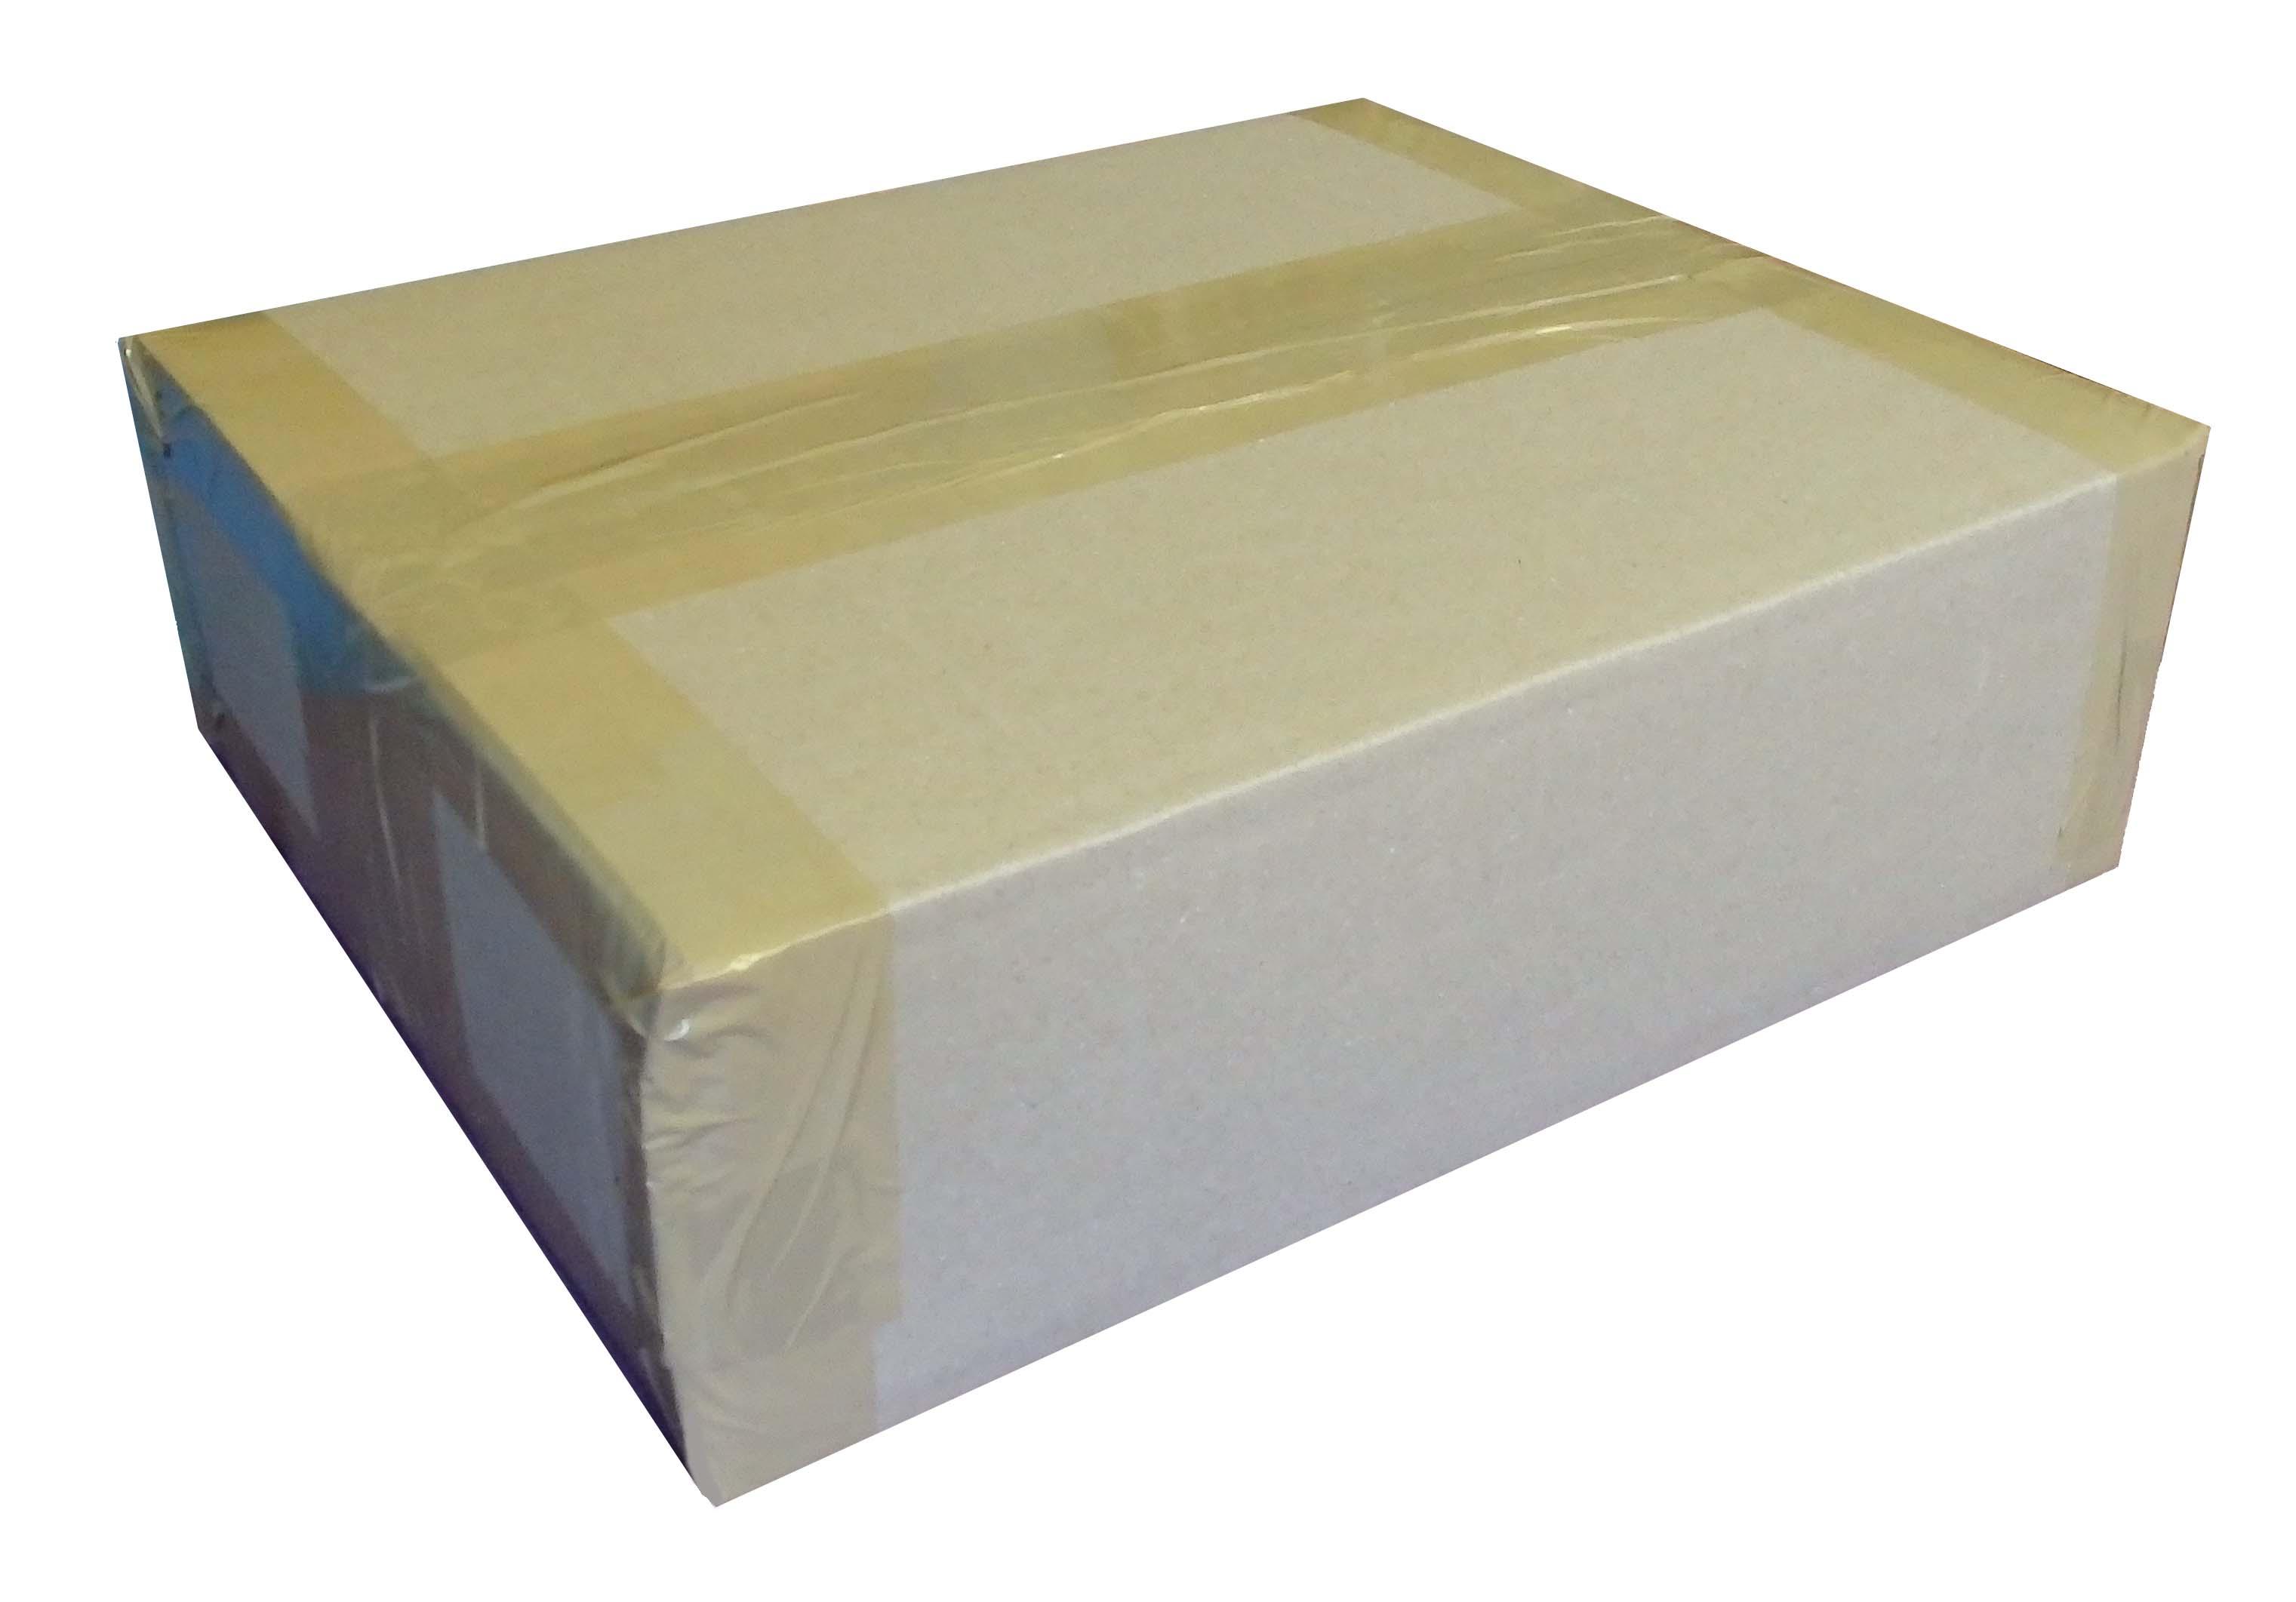 Shipping_Box_Closed_Juma_Instruments_Kalimbashop